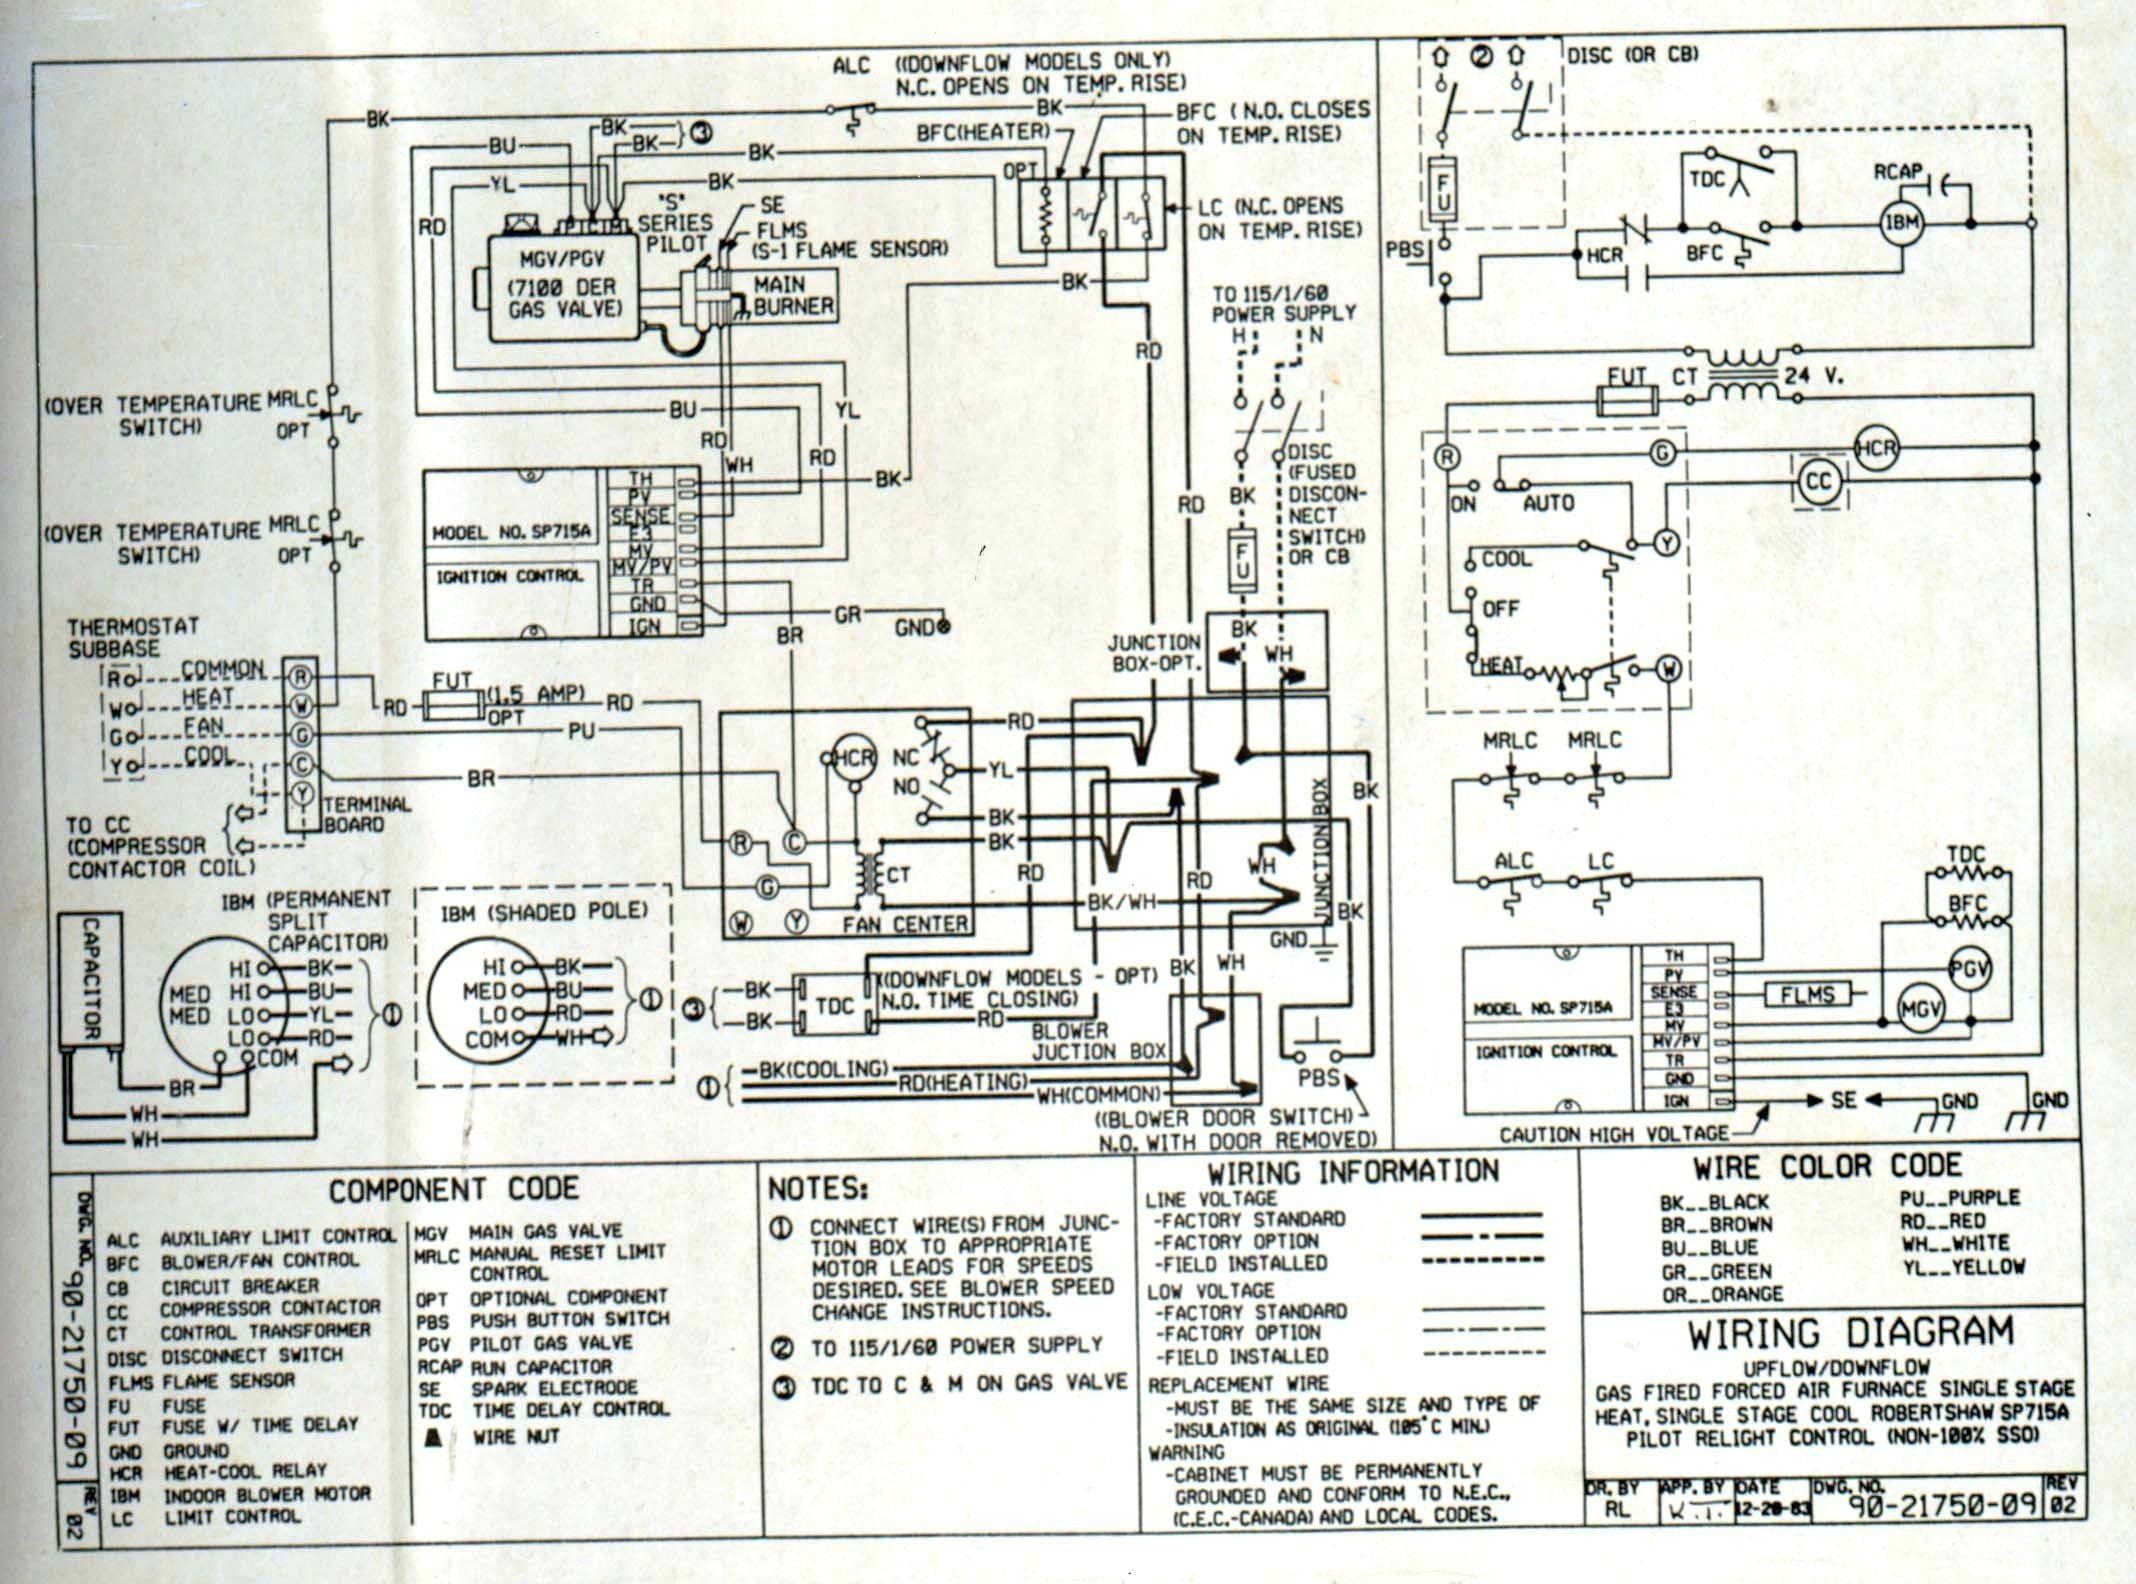 New Wiring Diagram For Nordyne Gas Furnace Diagram Diagramsample Diagramtemplate Wiringdiagram Diagramch Electrical Diagram Diagram Trailer Wiring Diagram